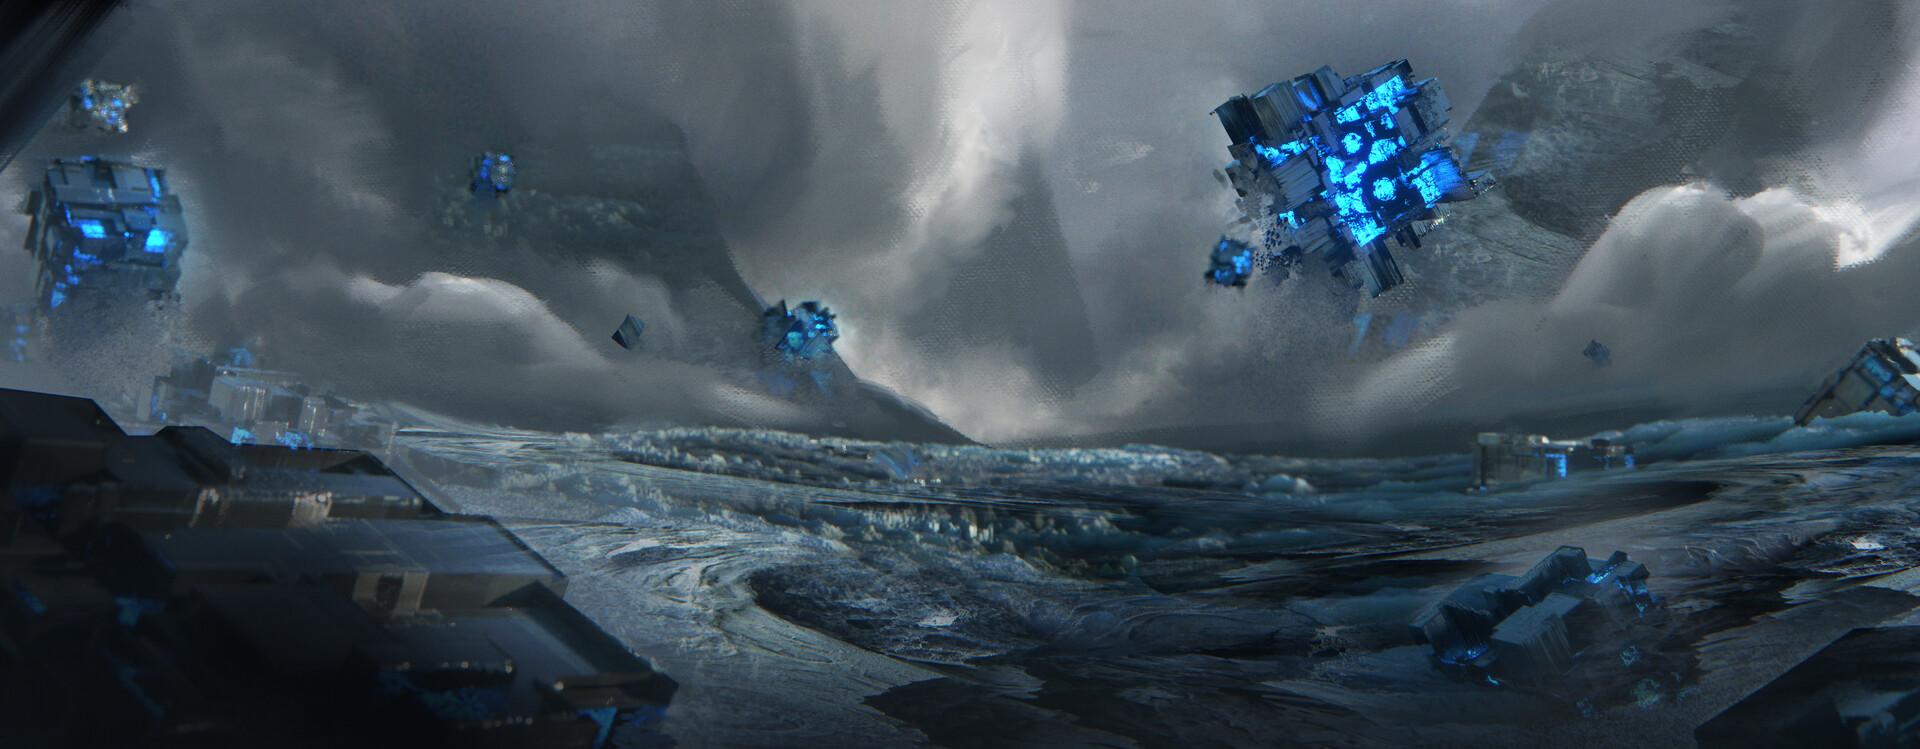 Leon tukker cube keyframe3